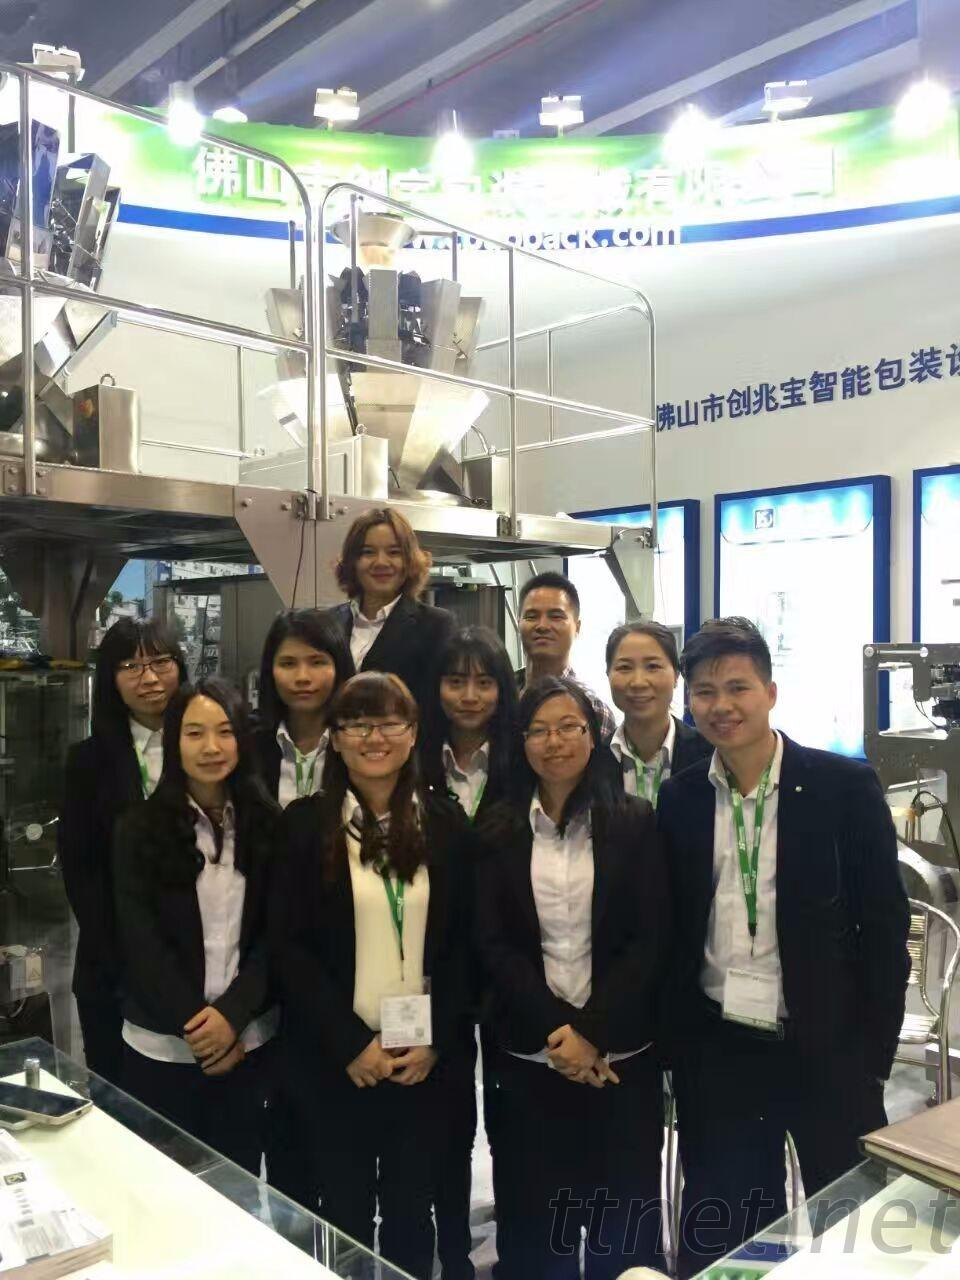 Baopack Auto Packaging Machine Co., Ltd.